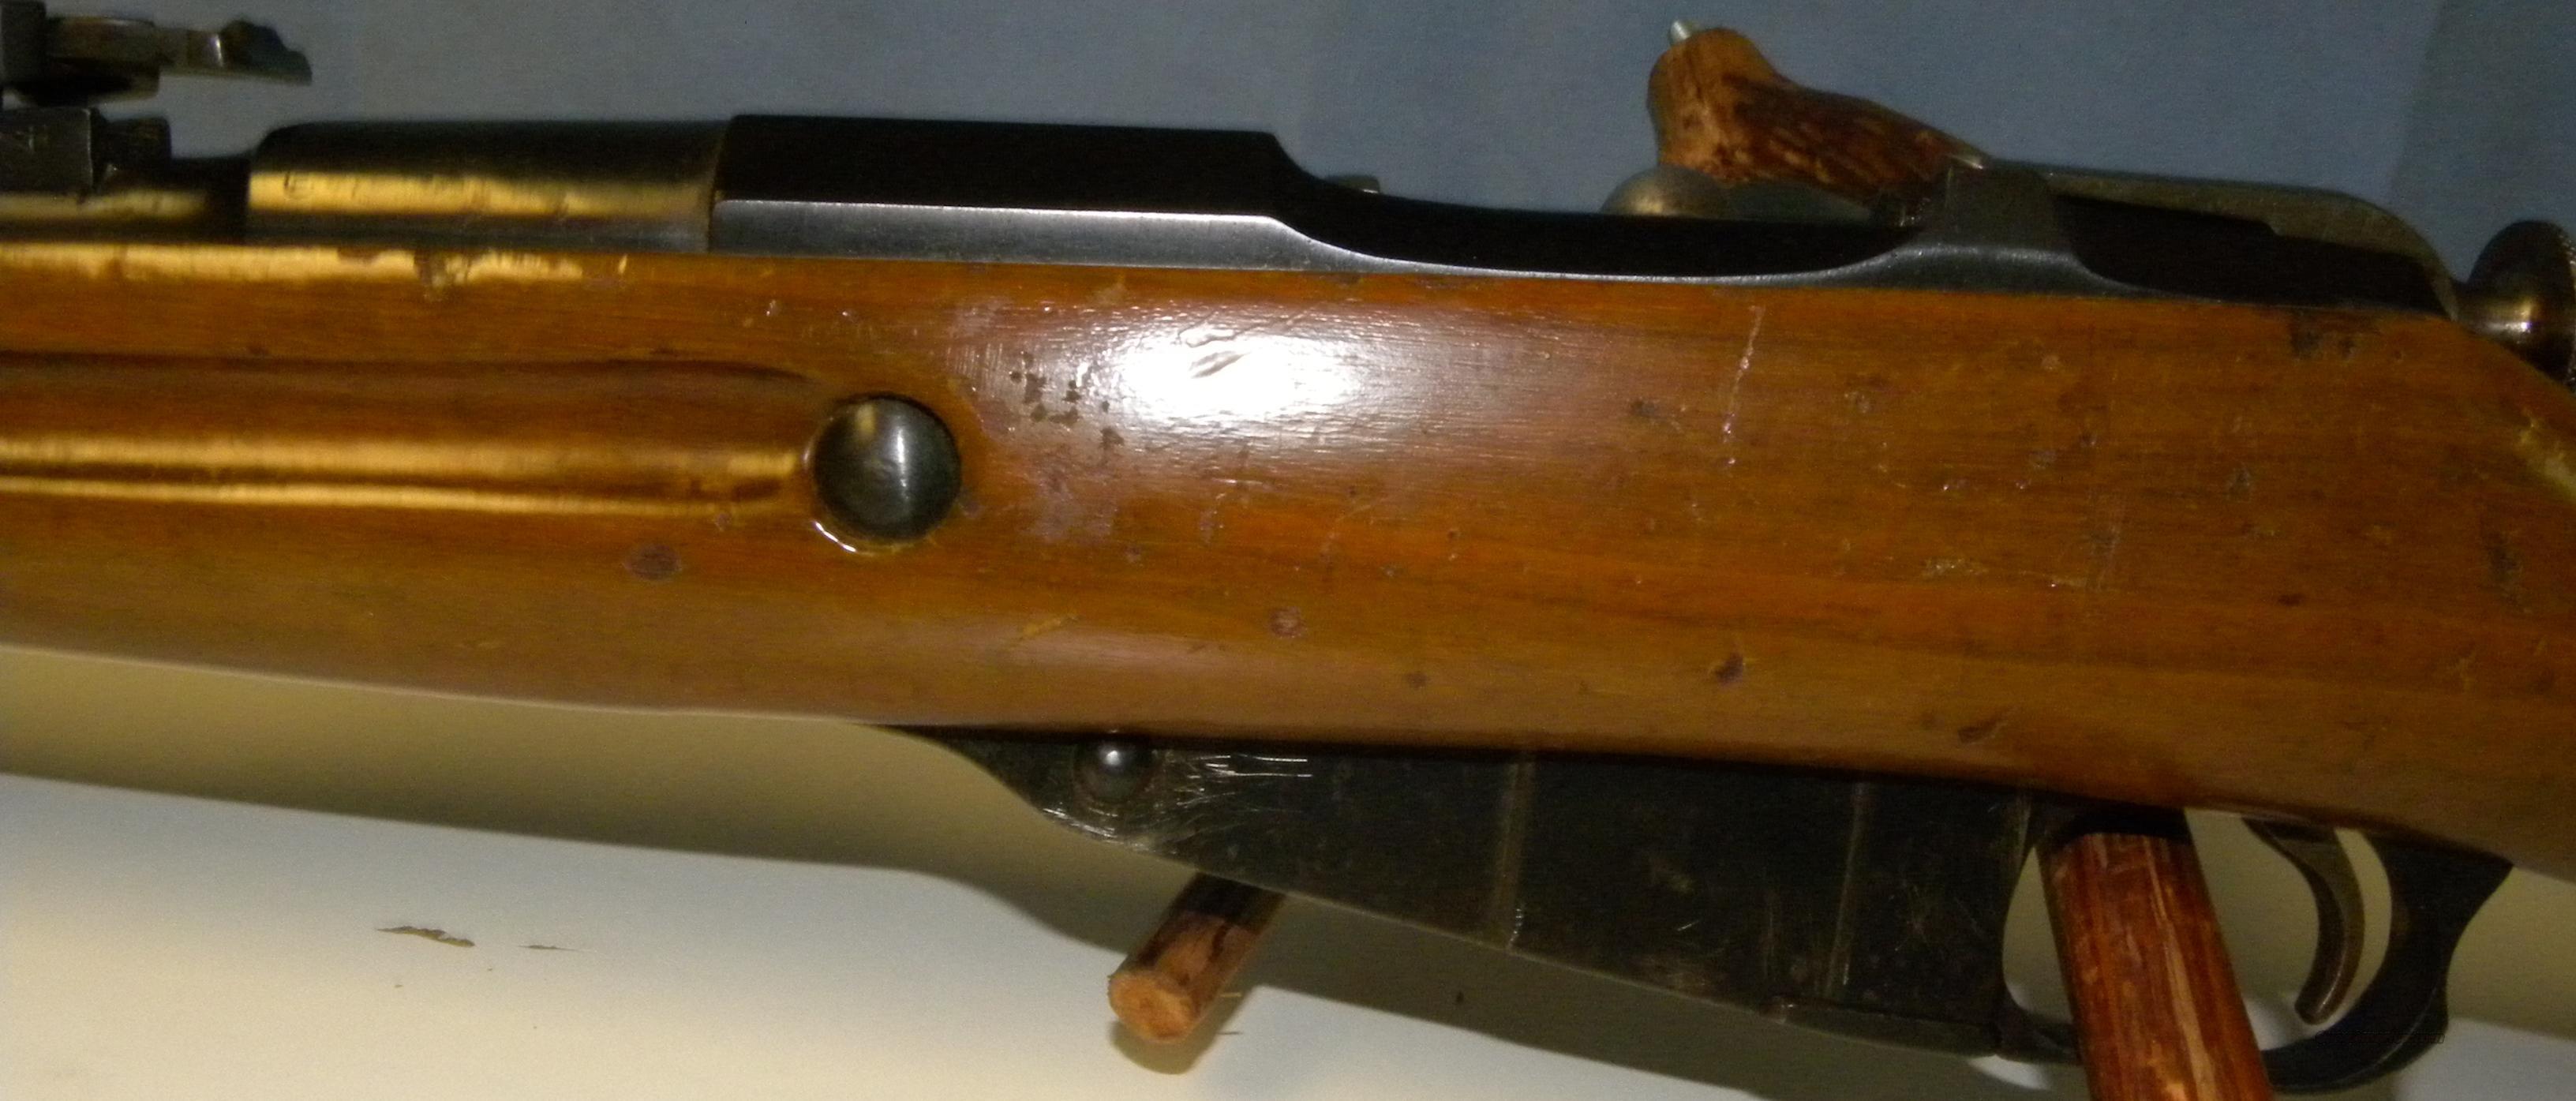 Remington 1891 Mosin Nagant for sale